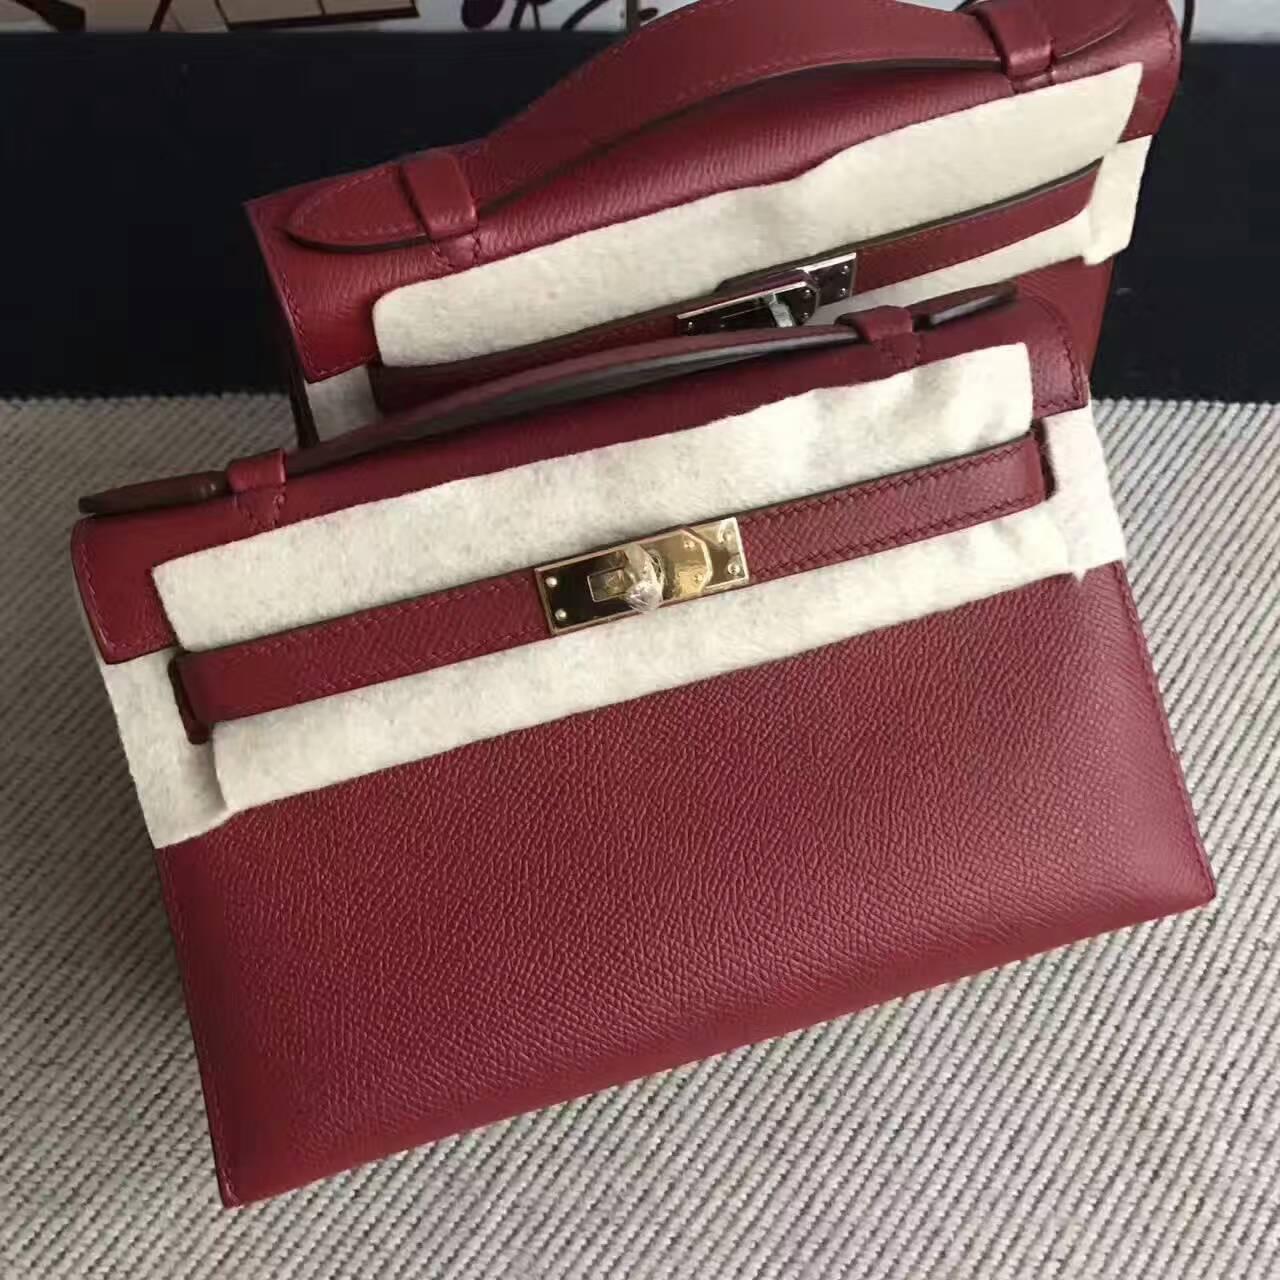 Cheap Hermes K1 Rouge Grenade Epsom Calfskin Leather Minikelly Clutch Bag 22cm